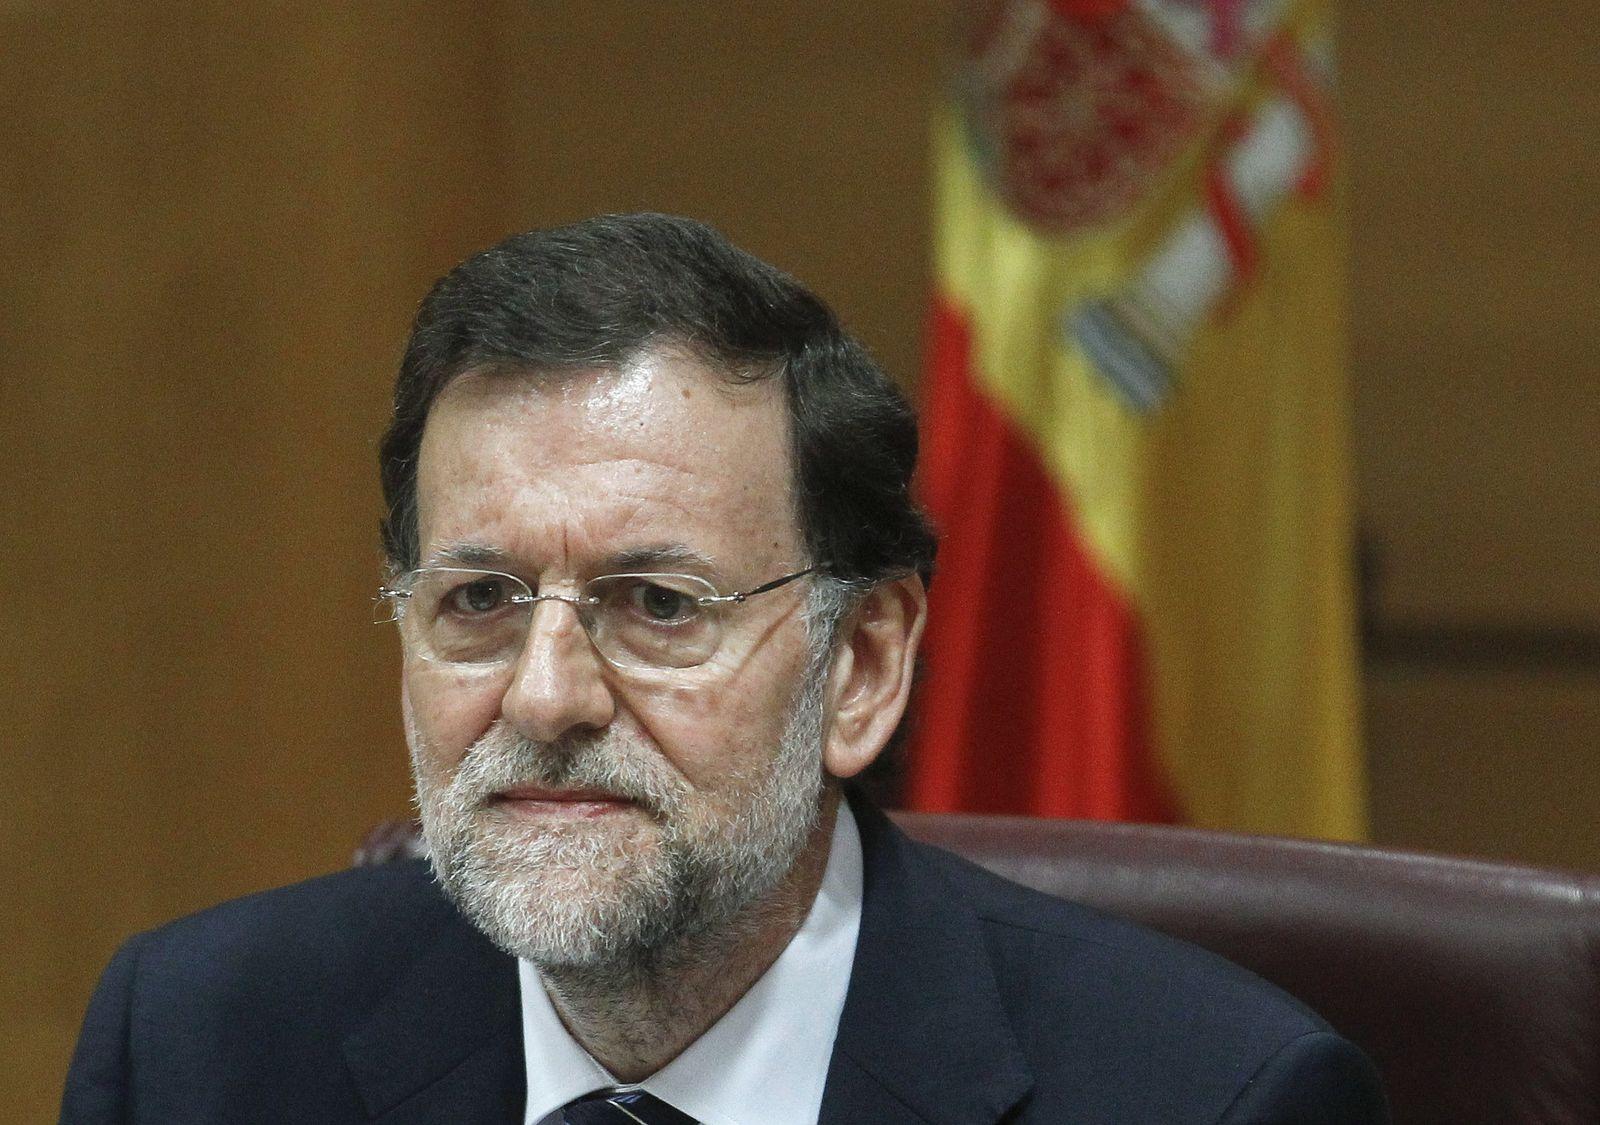 Rajoy Spanien Finanzkrise